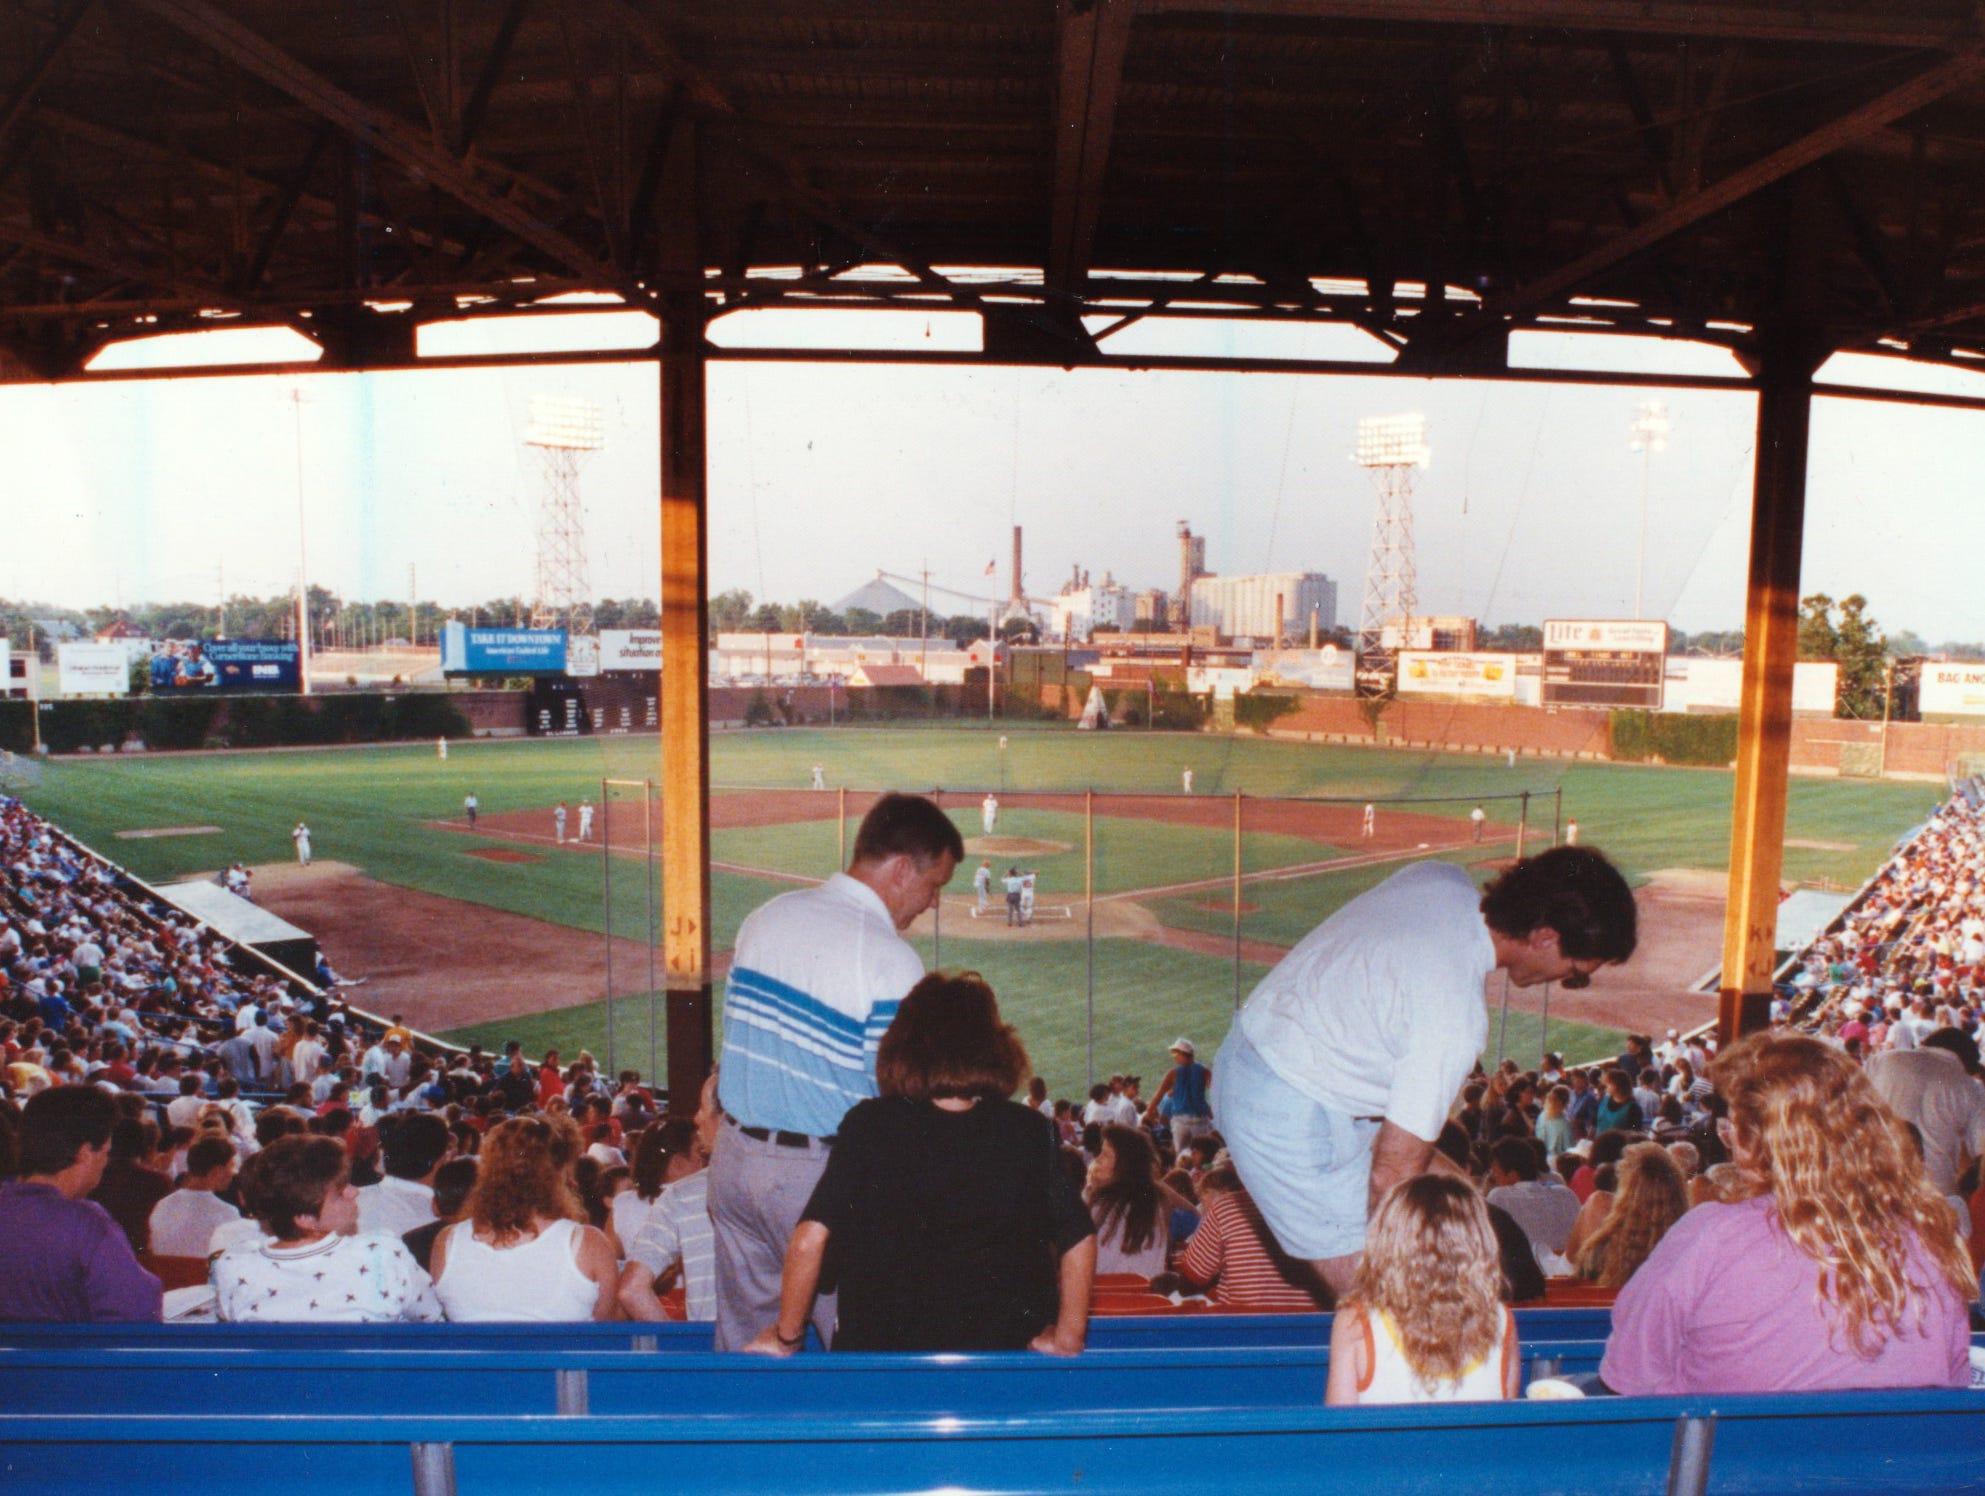 Families enjoy a great evening at Bush Stadium, June 20, 1991.